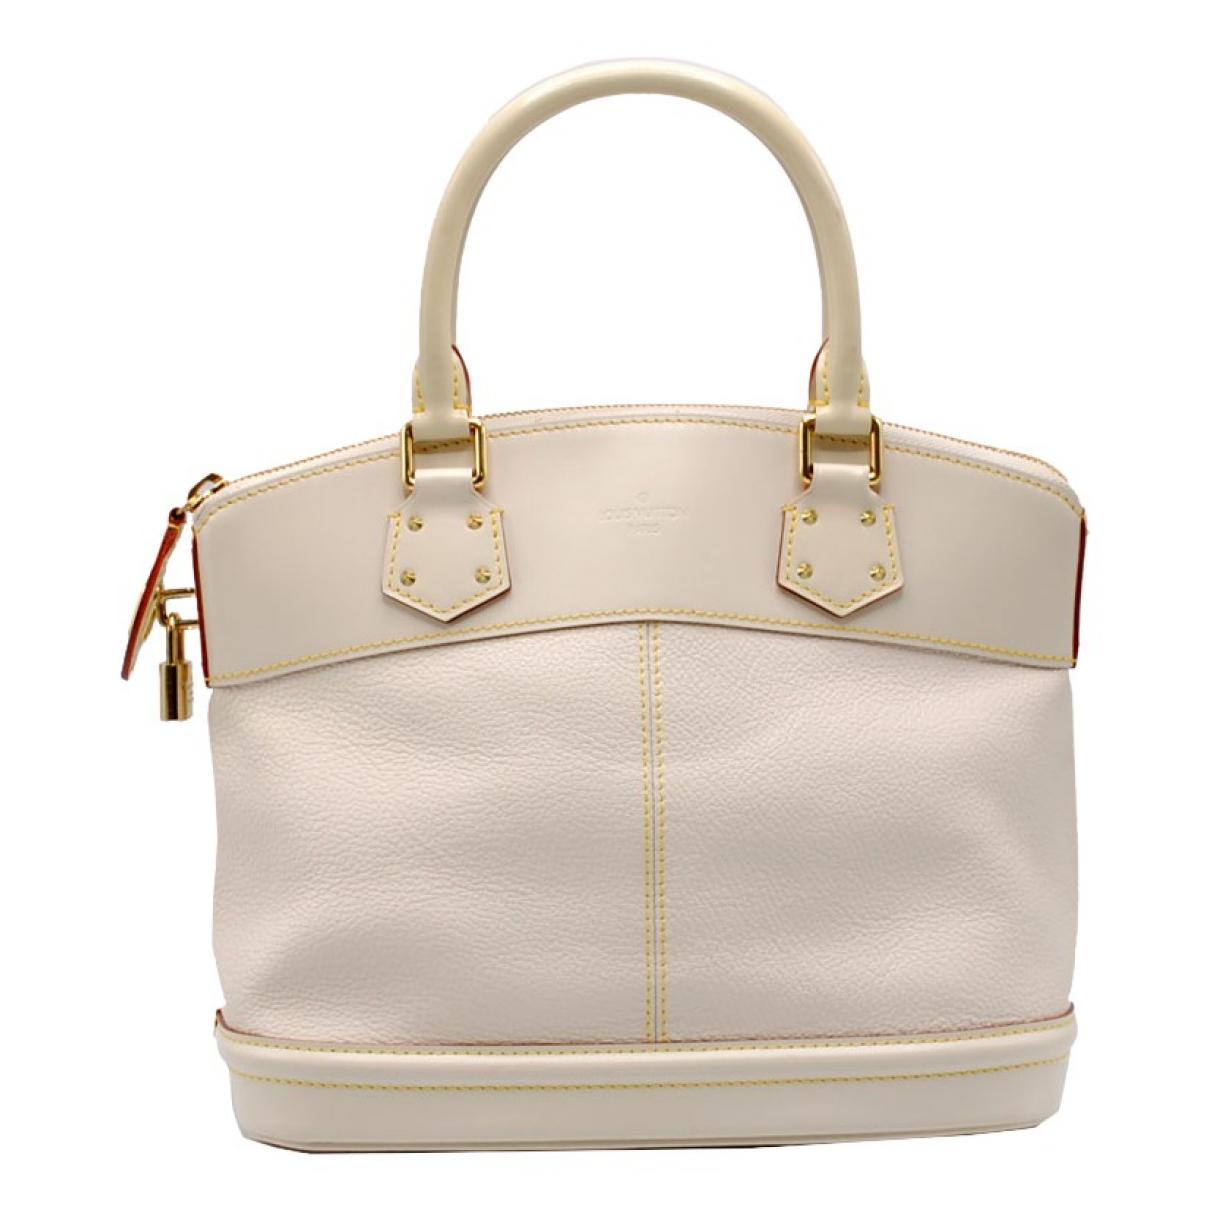 Louis Vuitton - Sac a main Lockit pour femme en cuir - ecru